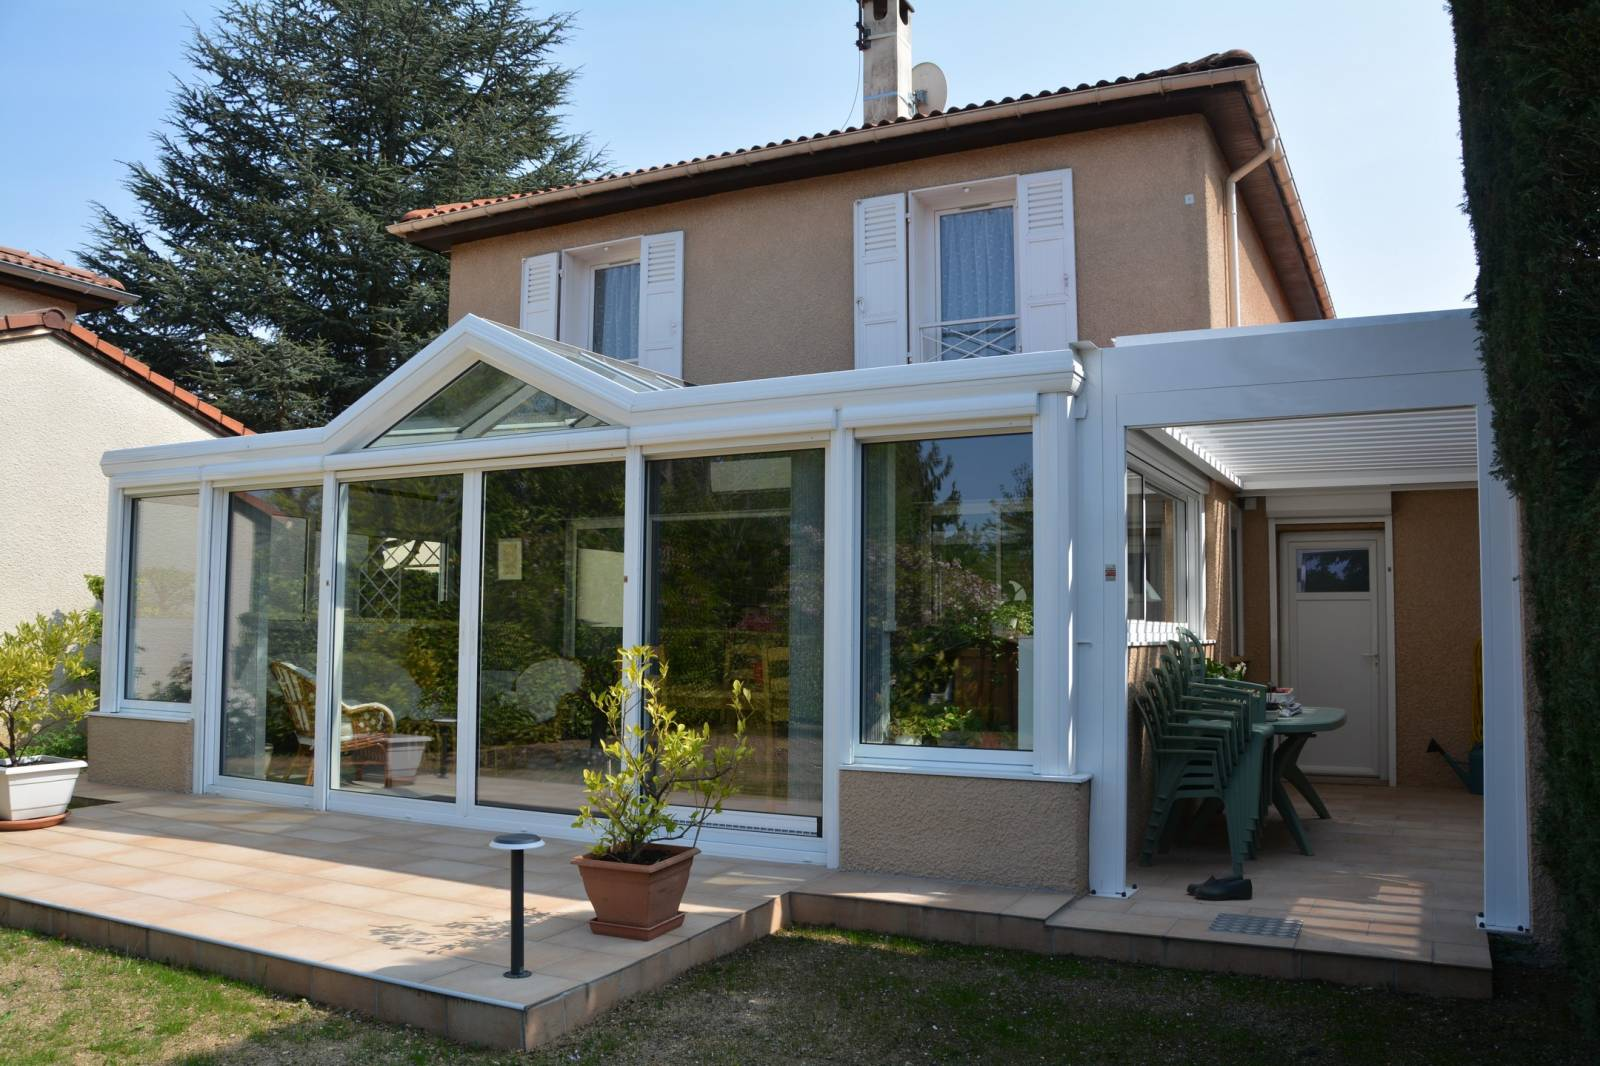 Faire Une Veranda concernant quel est le prix d'une veranda alu 20m² à lyon ? - perspective véranda